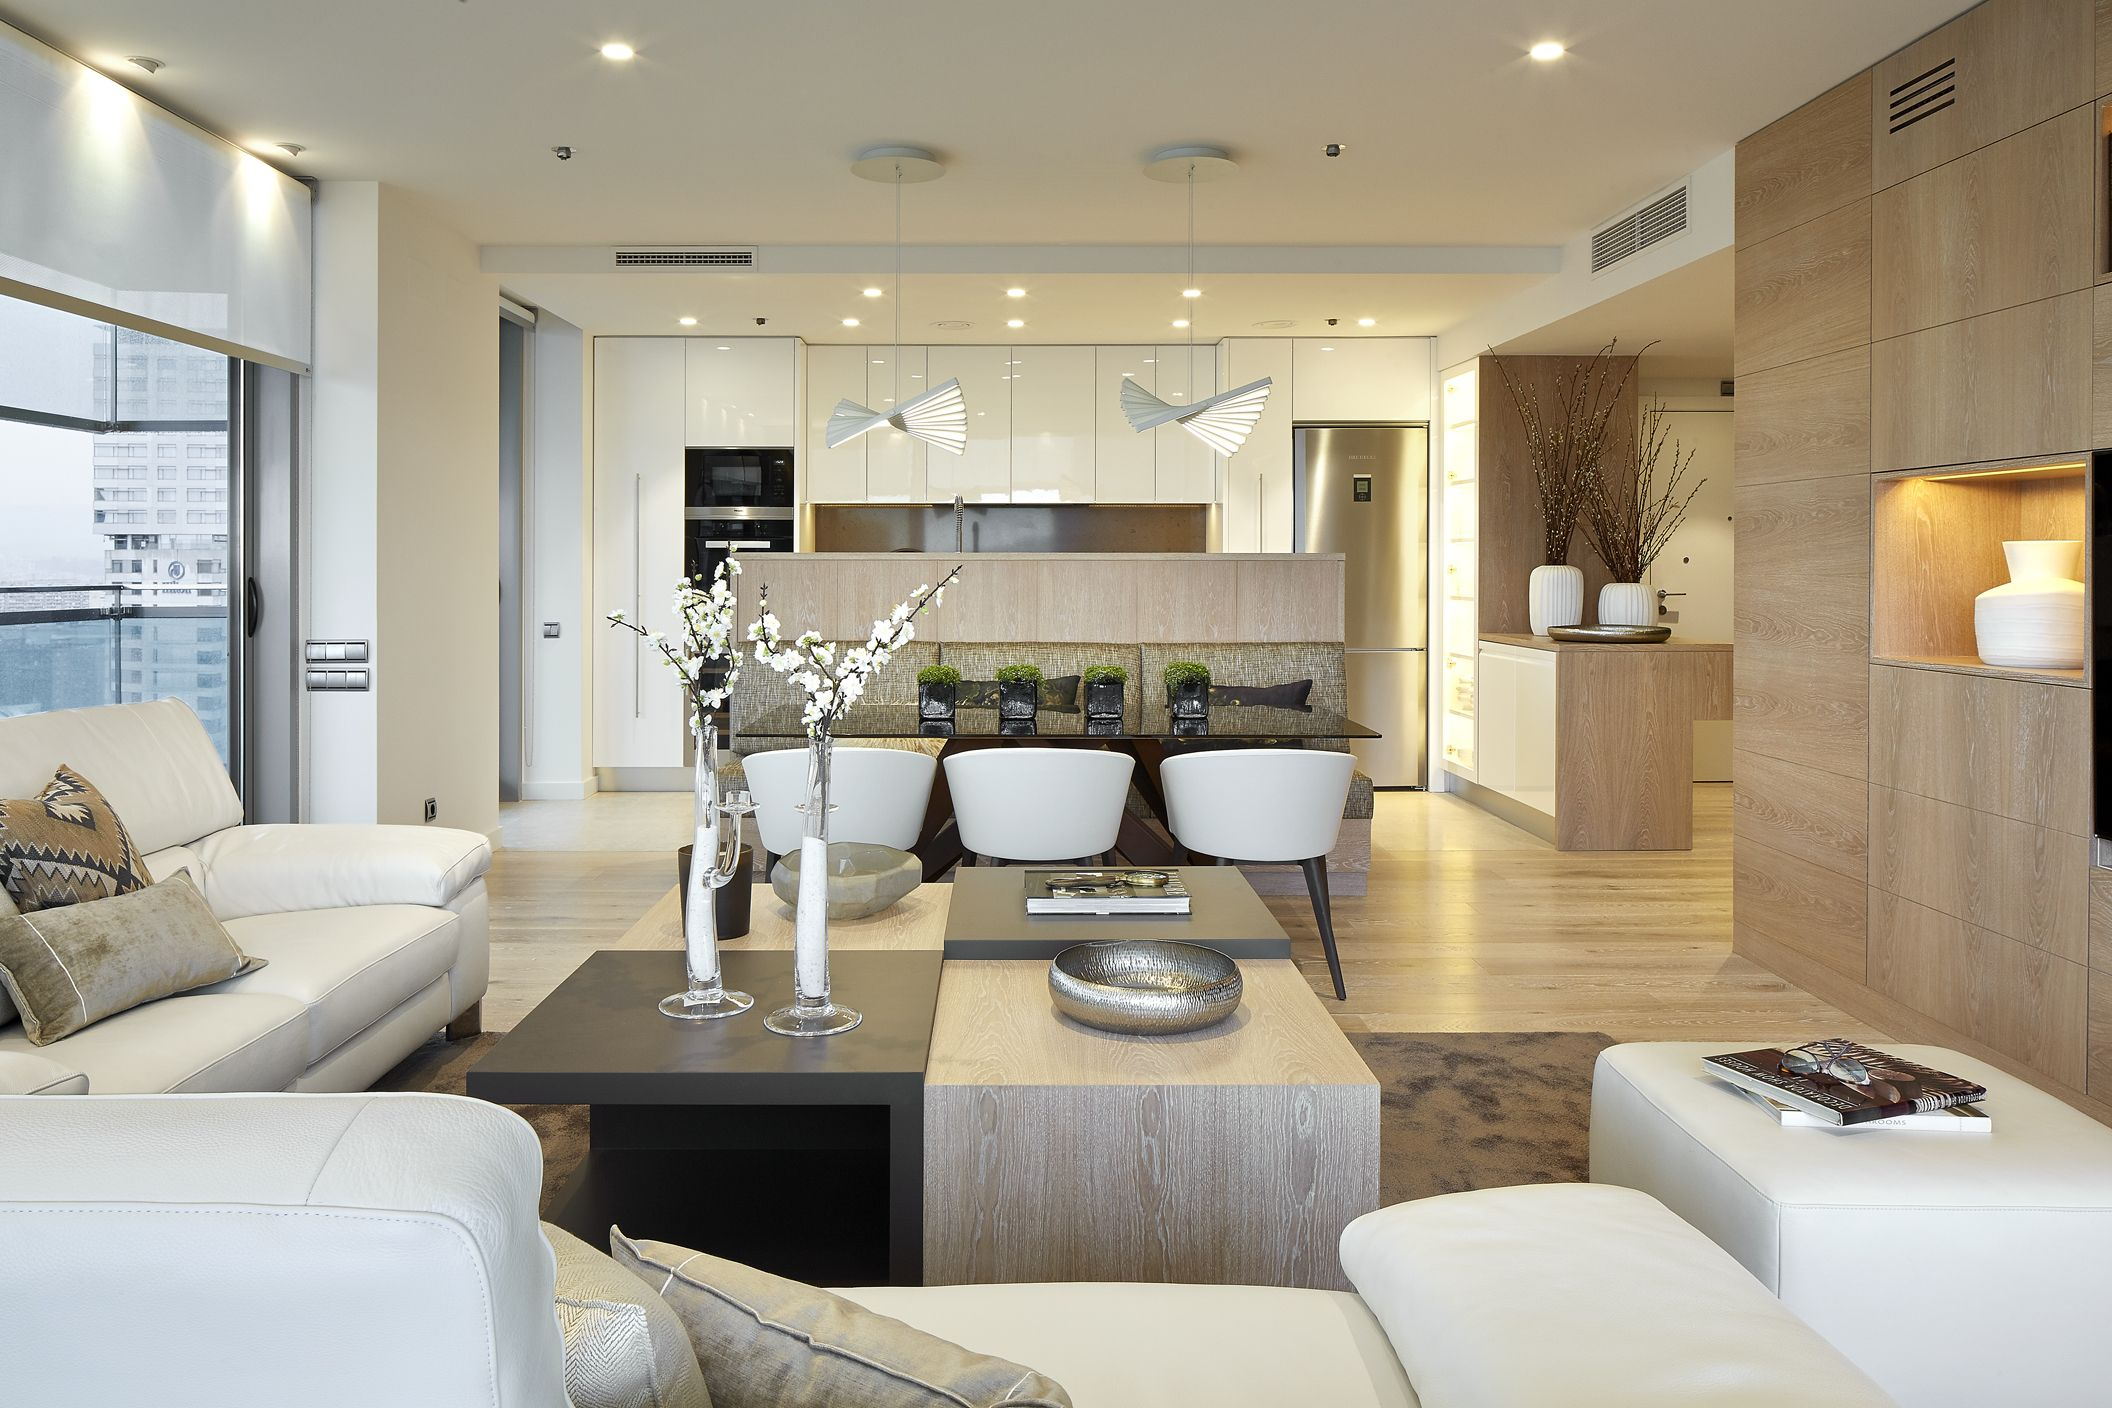 Molins interiors arquitectura interior interiorismo - Interiorismo salon comedor ...